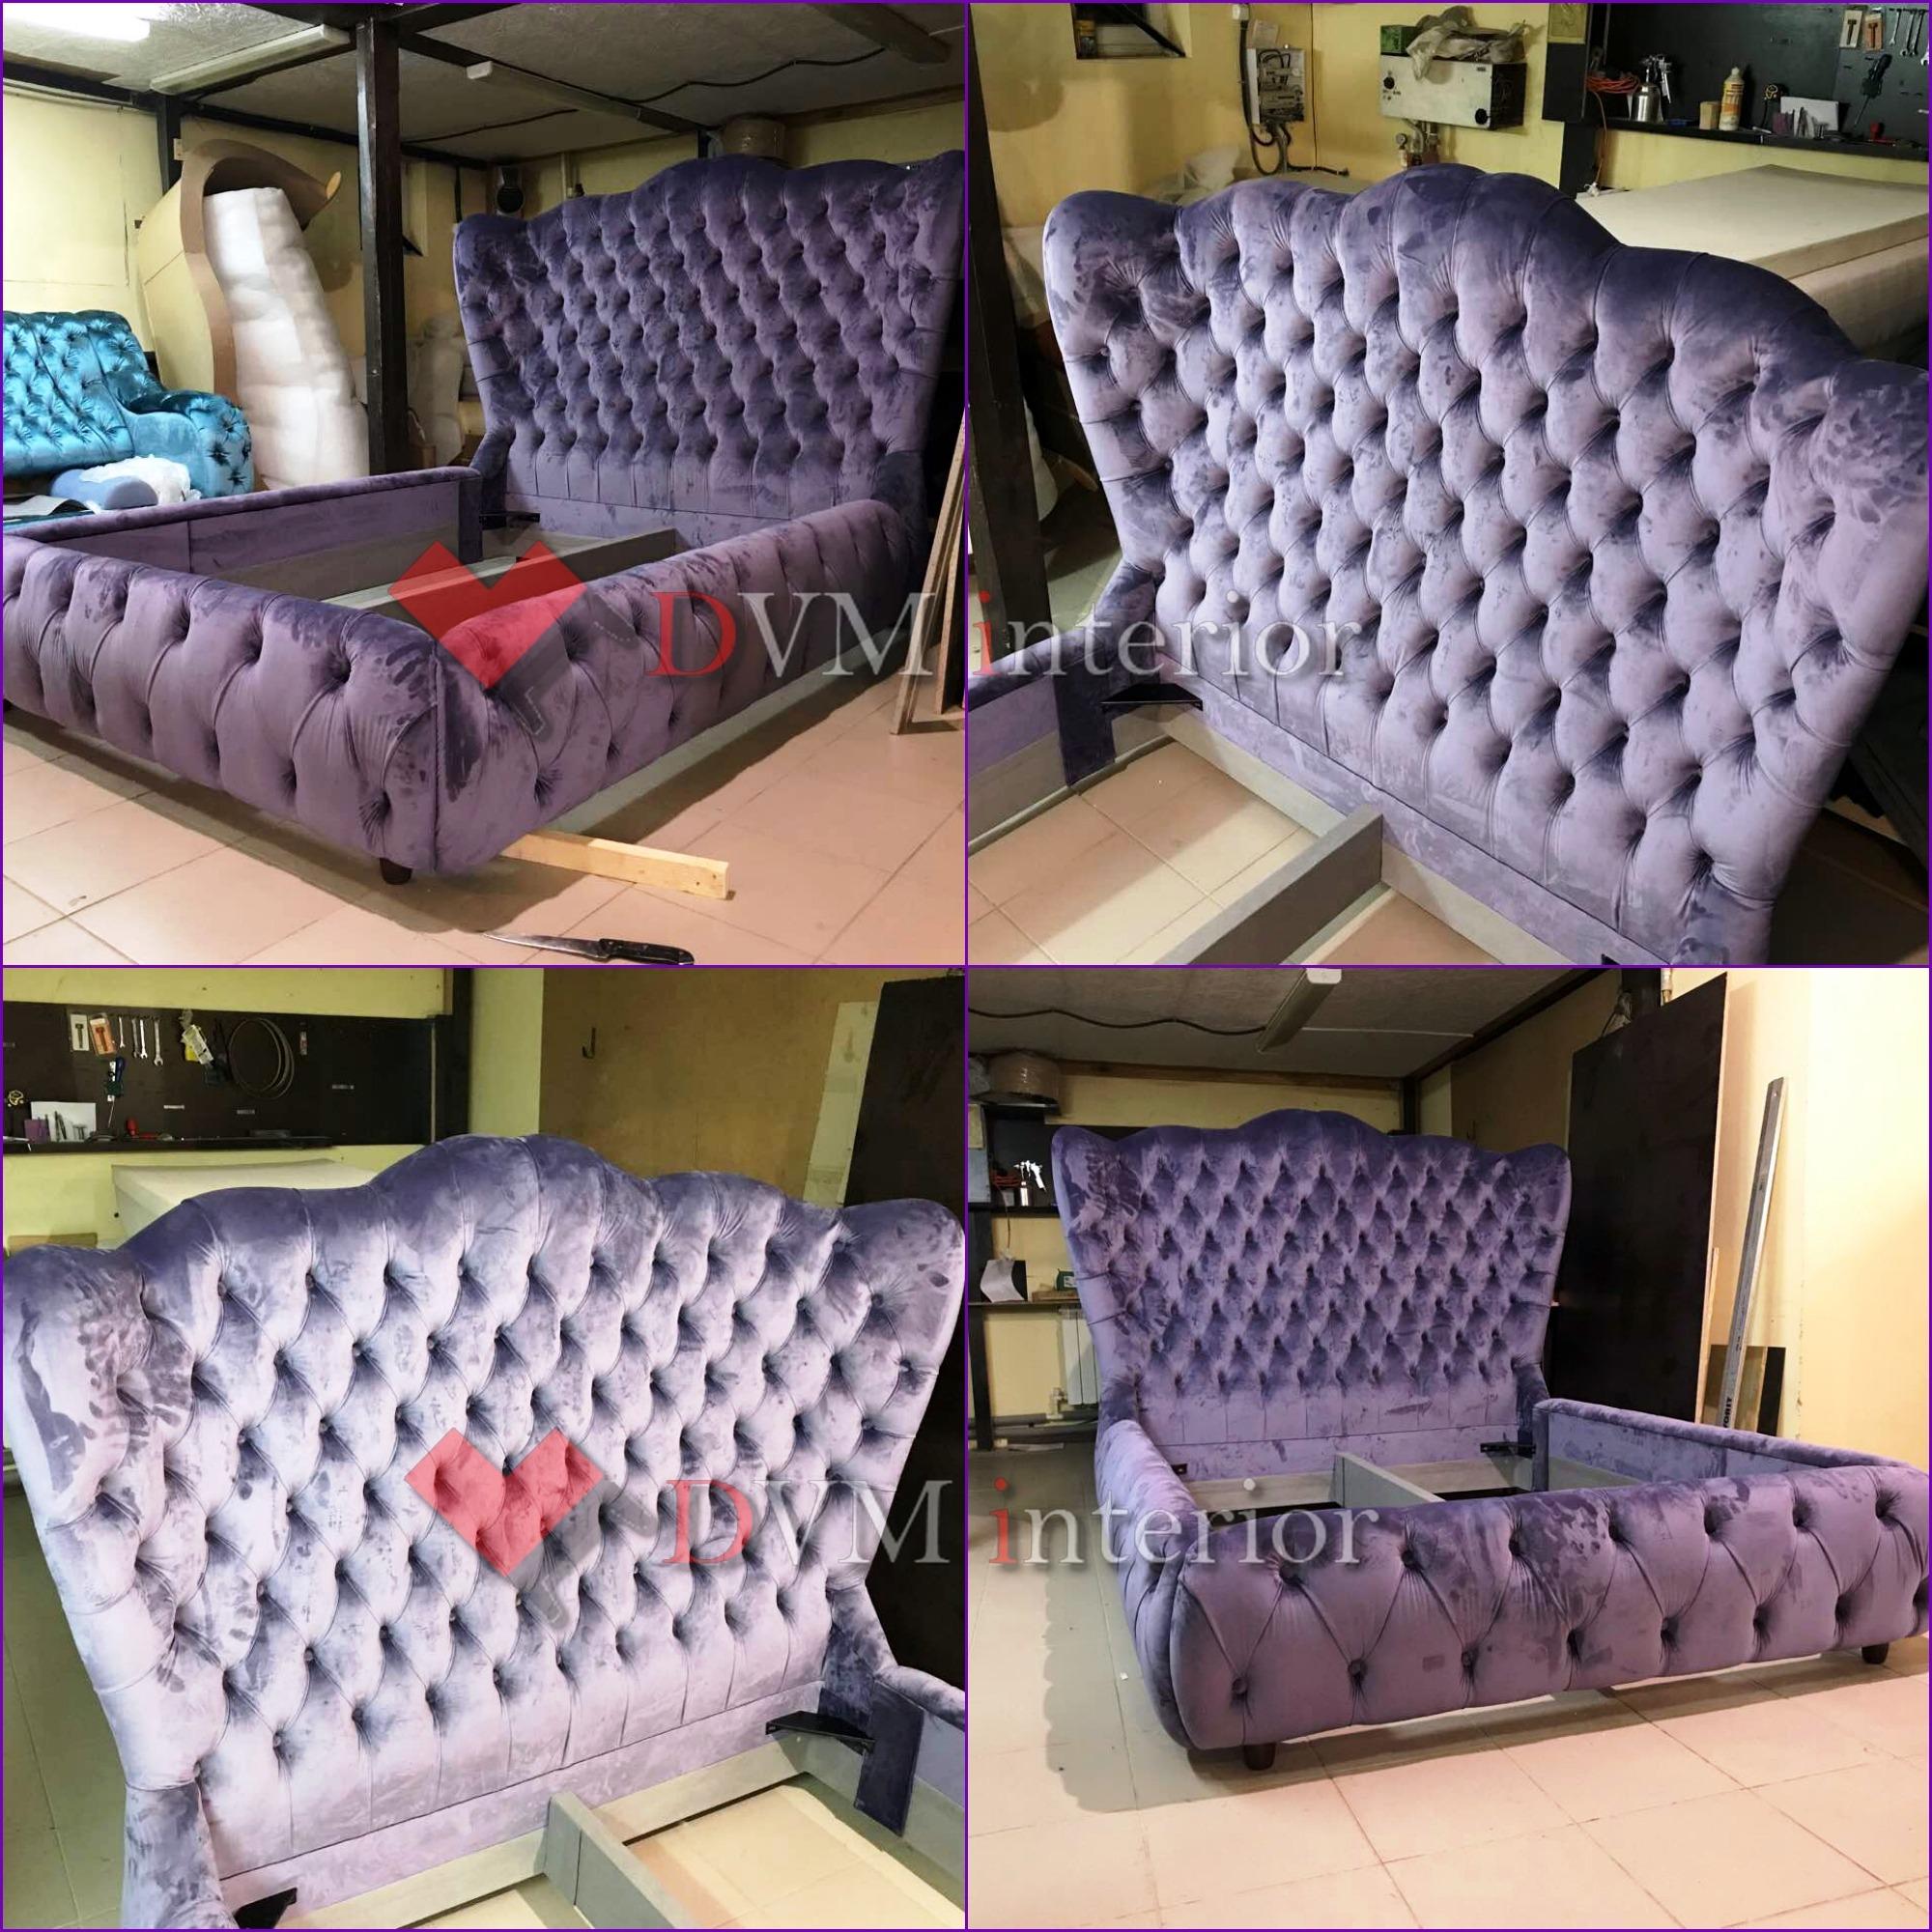 Krovat fioletovaya myagkaya - Кровать фиолетовая мягкая